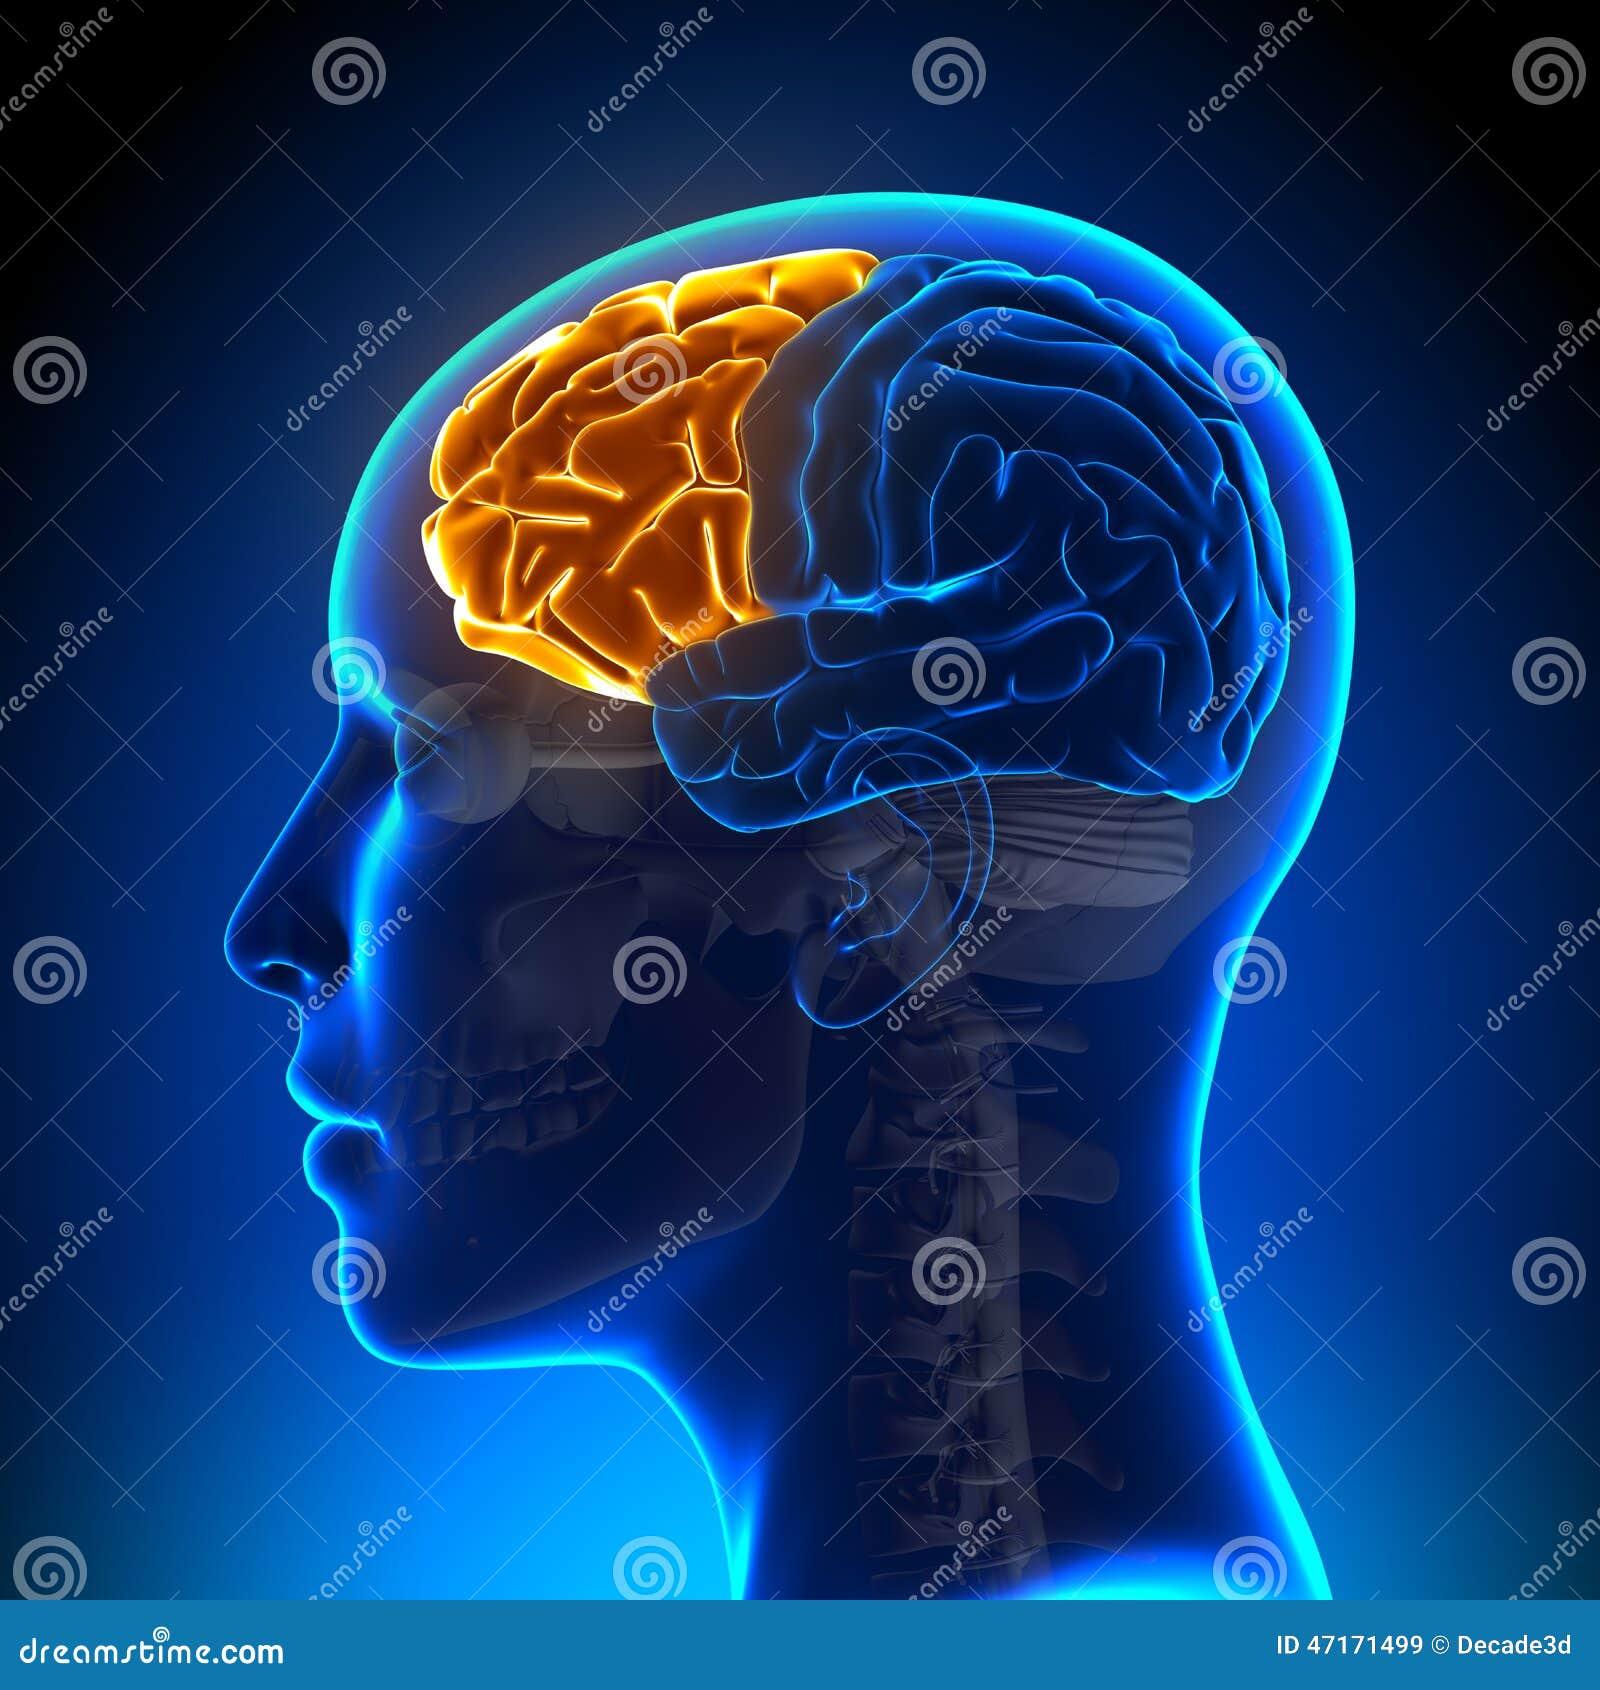 Female frontal anatomy